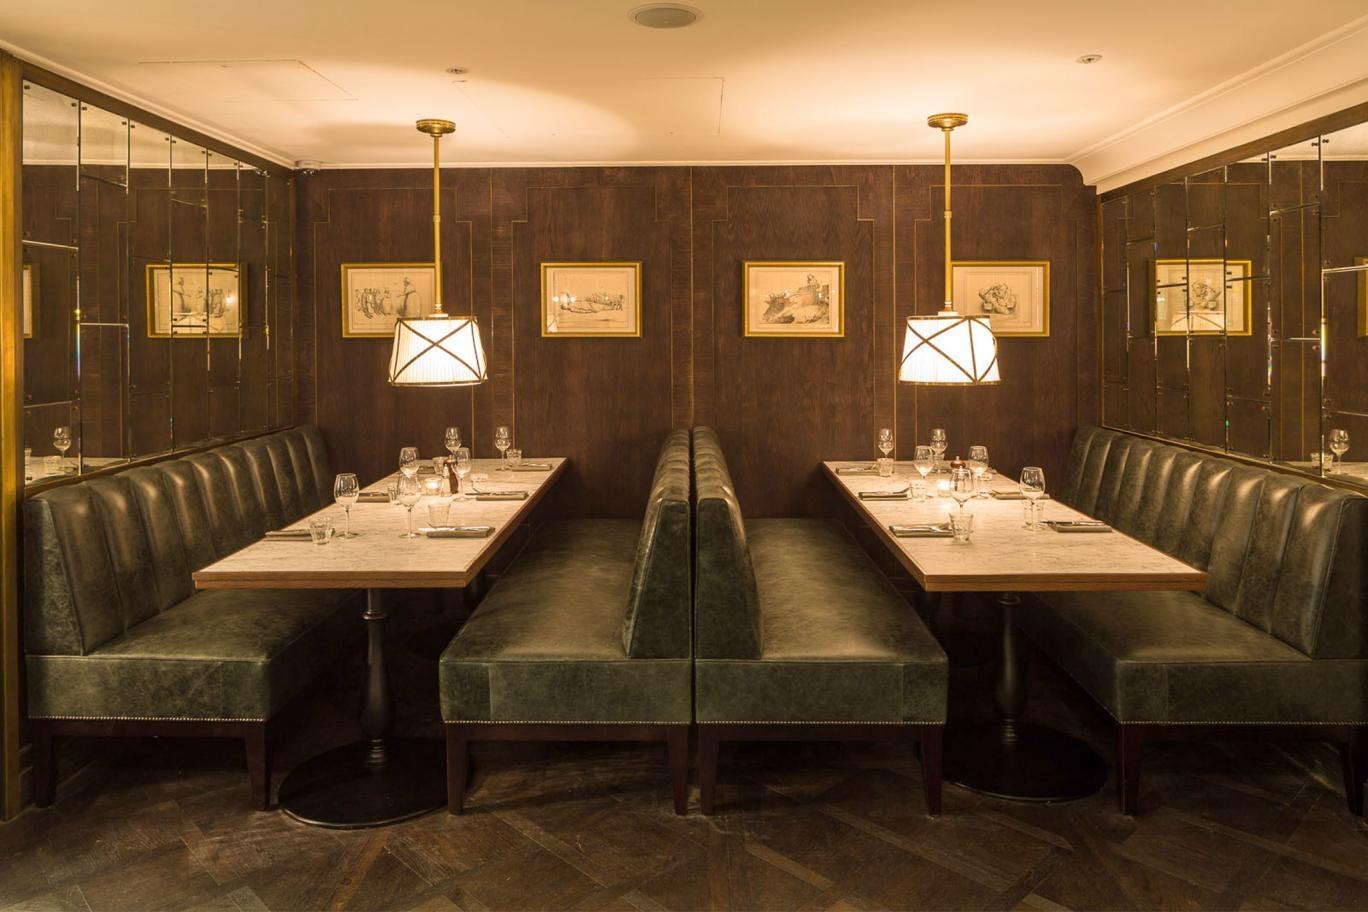 Clubbishly attractive: The restaurant's small, dark dining room has been de-blinged